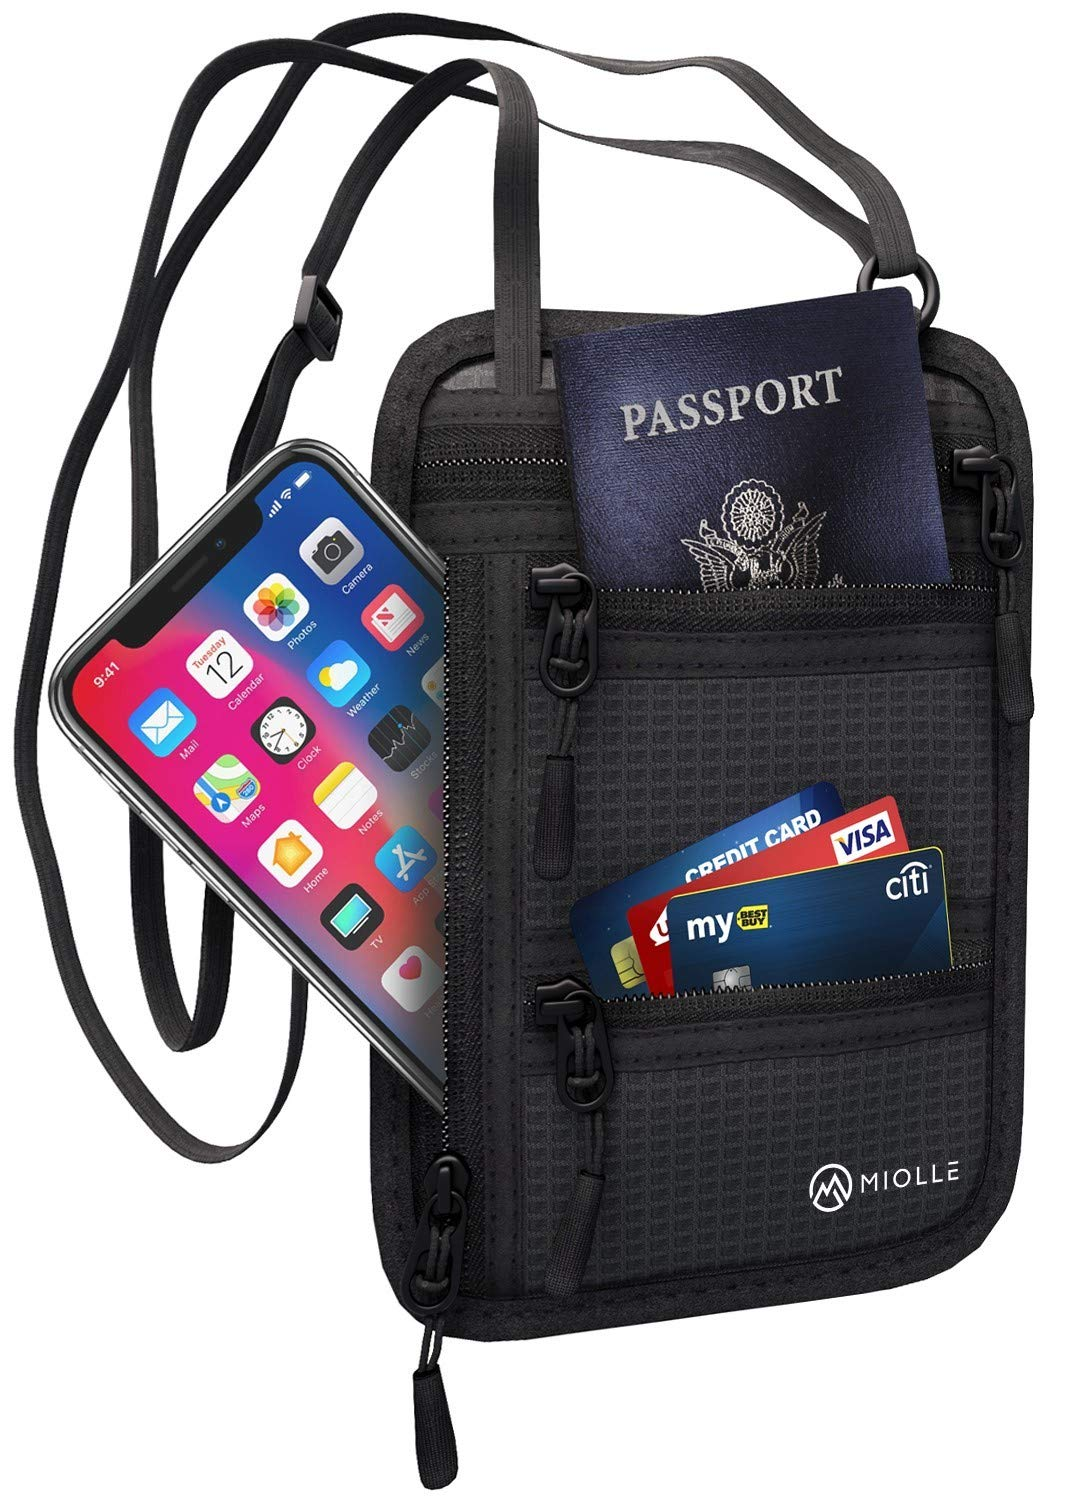 Neck Wallet Passport Holder Neck RFID Blocking Travel Pouch Travel Neck Wallet Travel Document Holder Organizer Anti Theft Security for Men and Women by Miolle